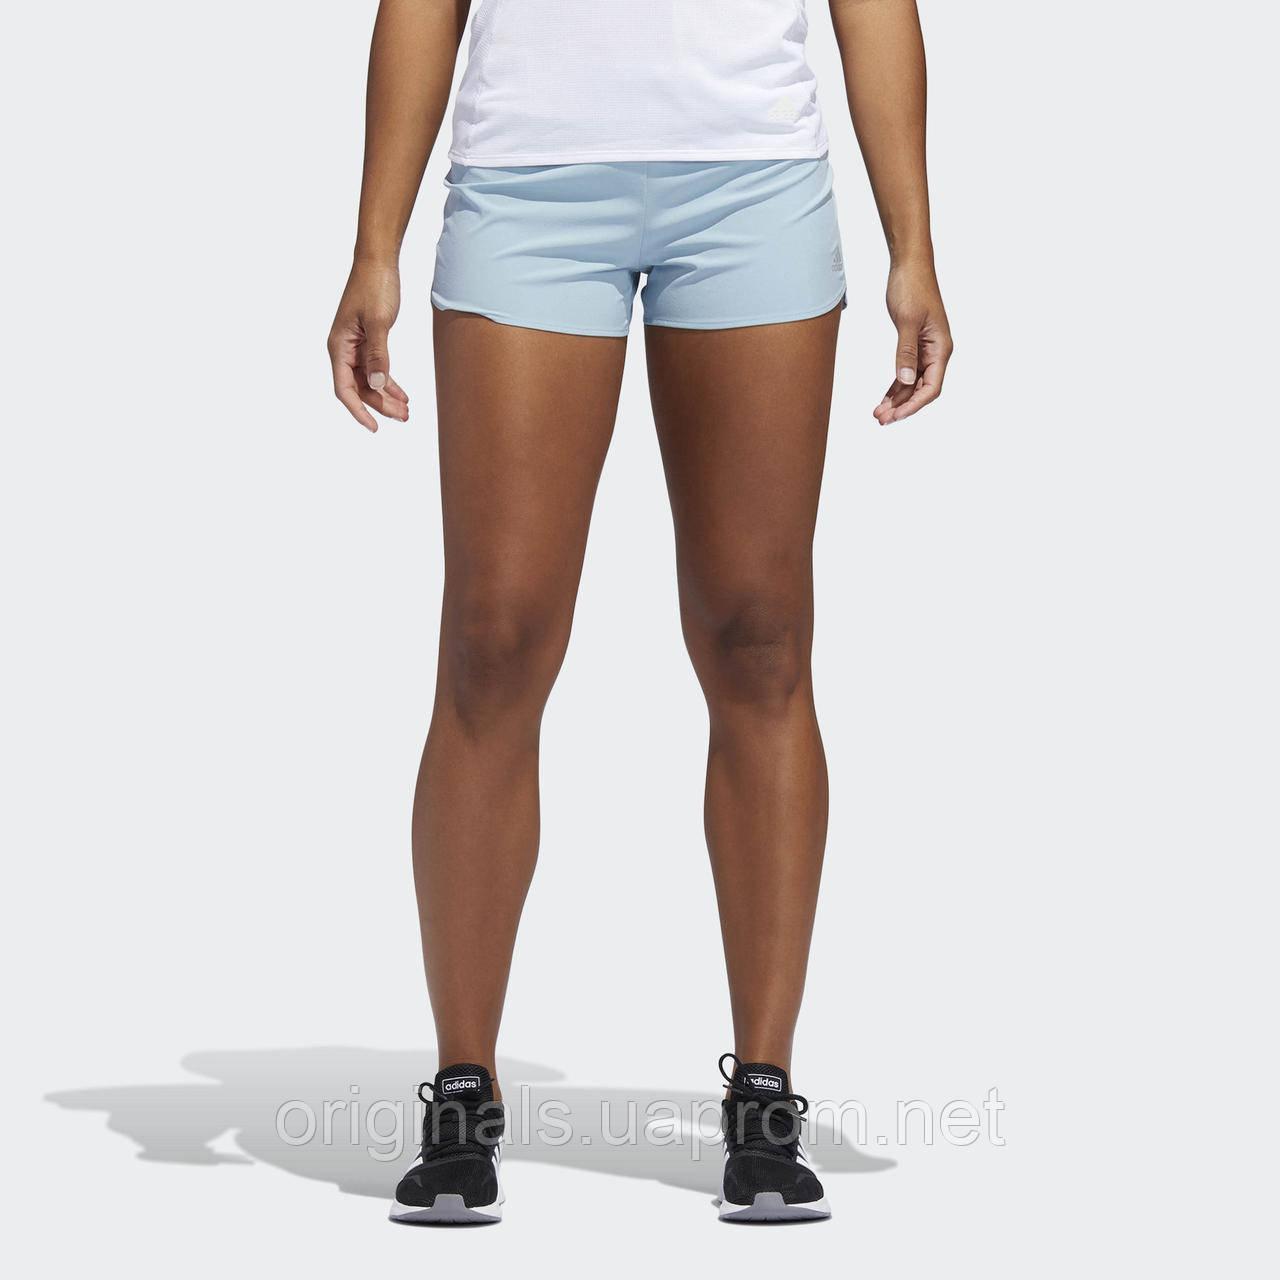 Беговые шорты женские Adidas Supernova Saturday W DQ1931